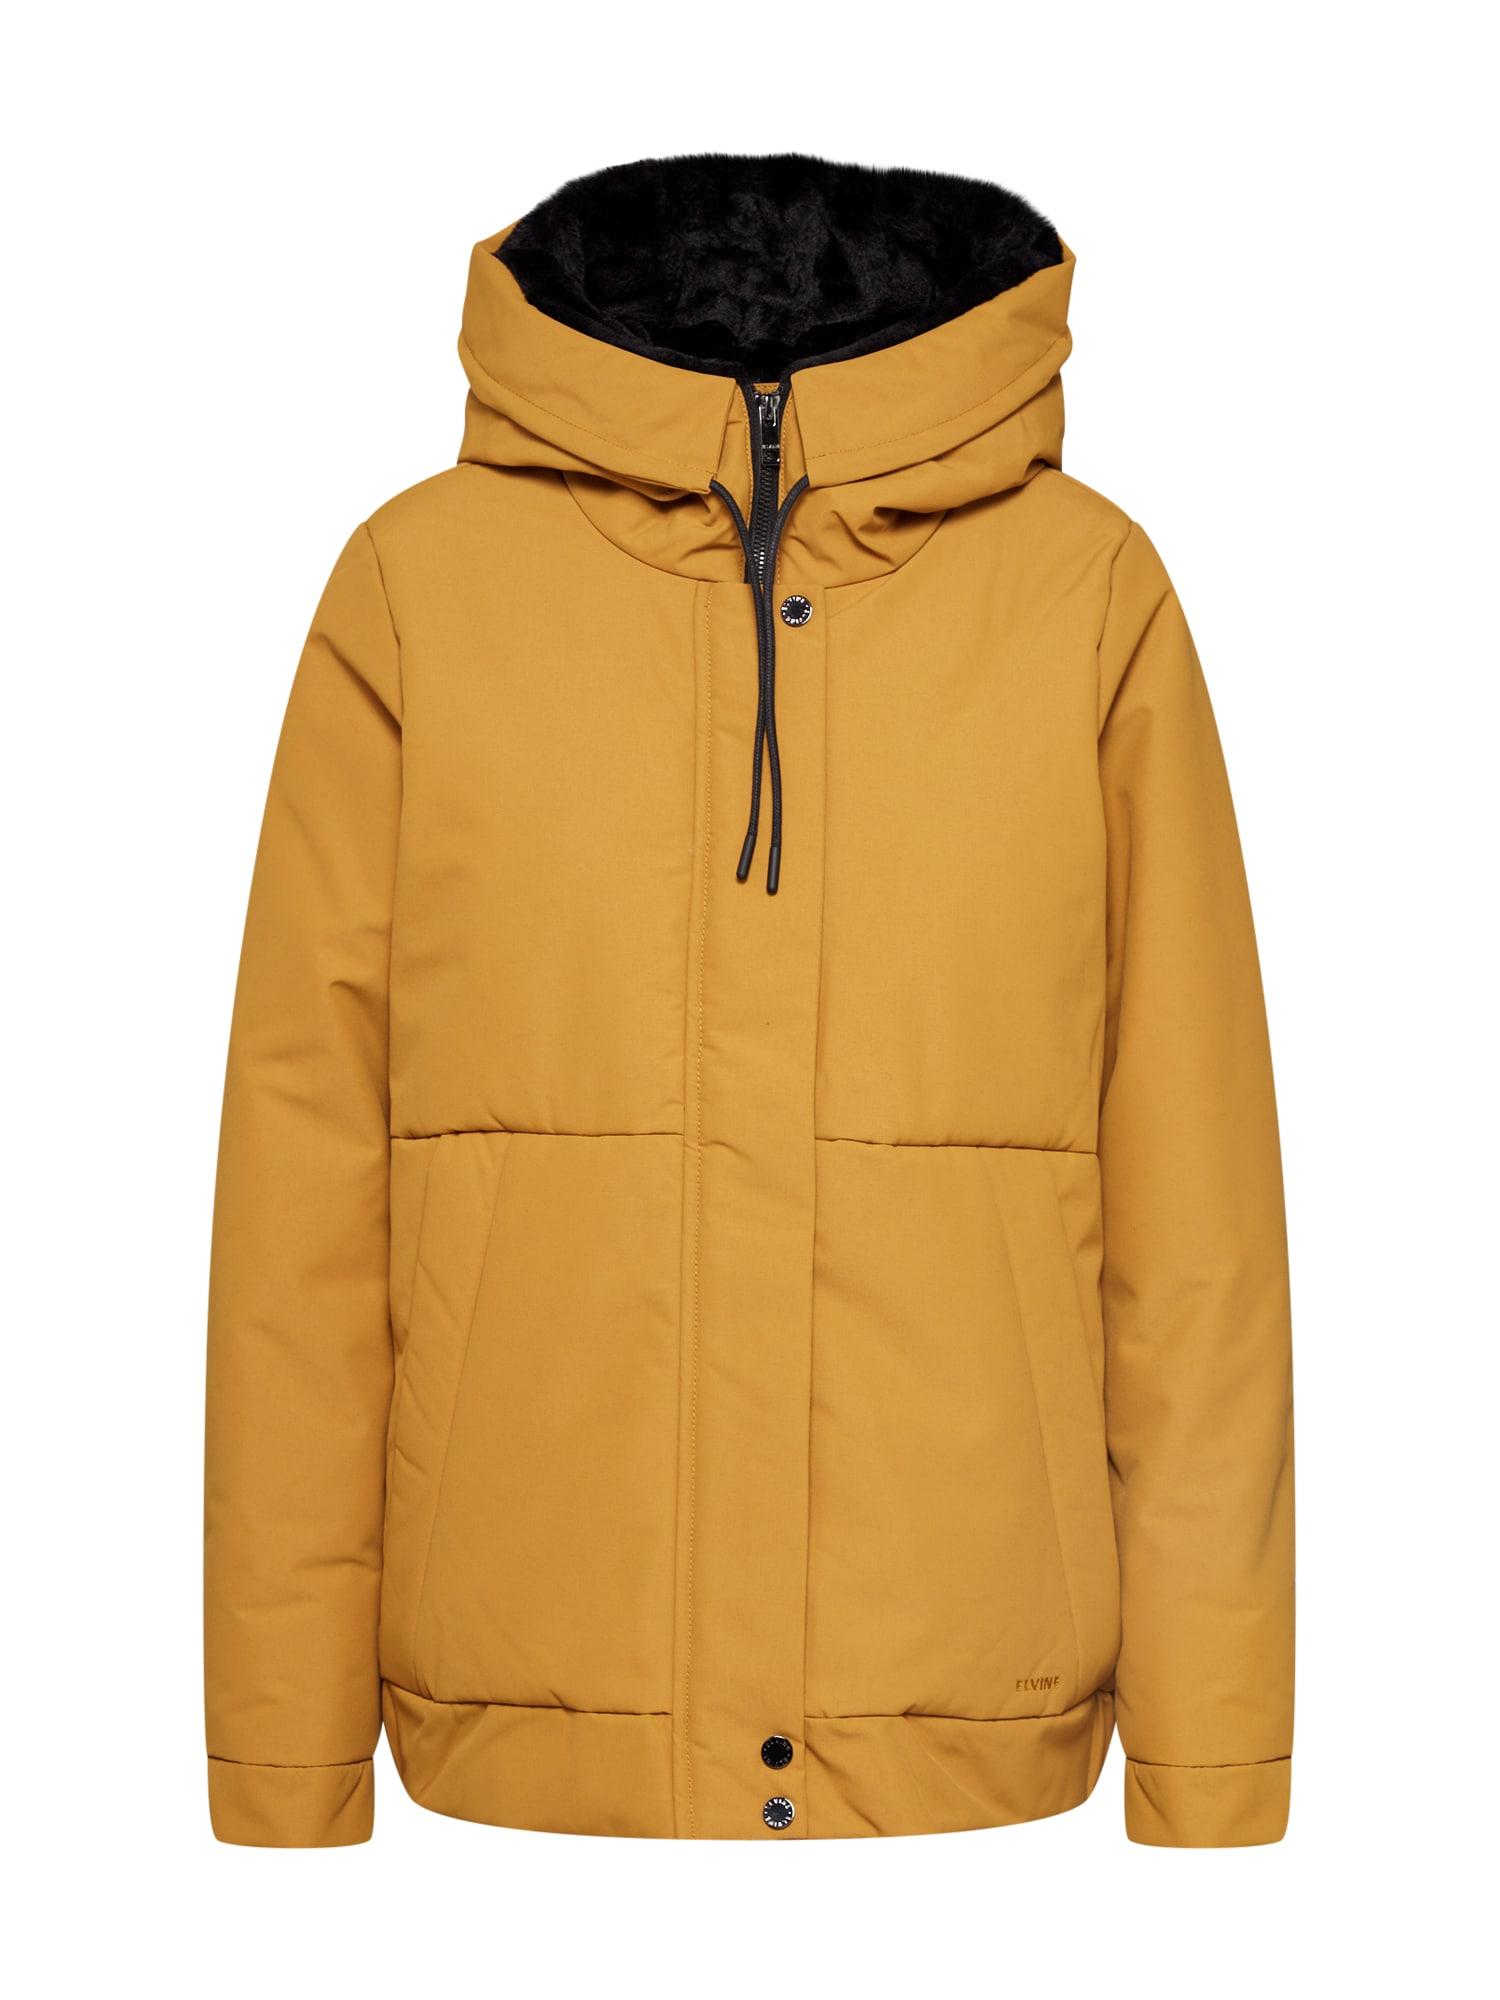 elvine Žieminė striukė 'Tehlla' geltona